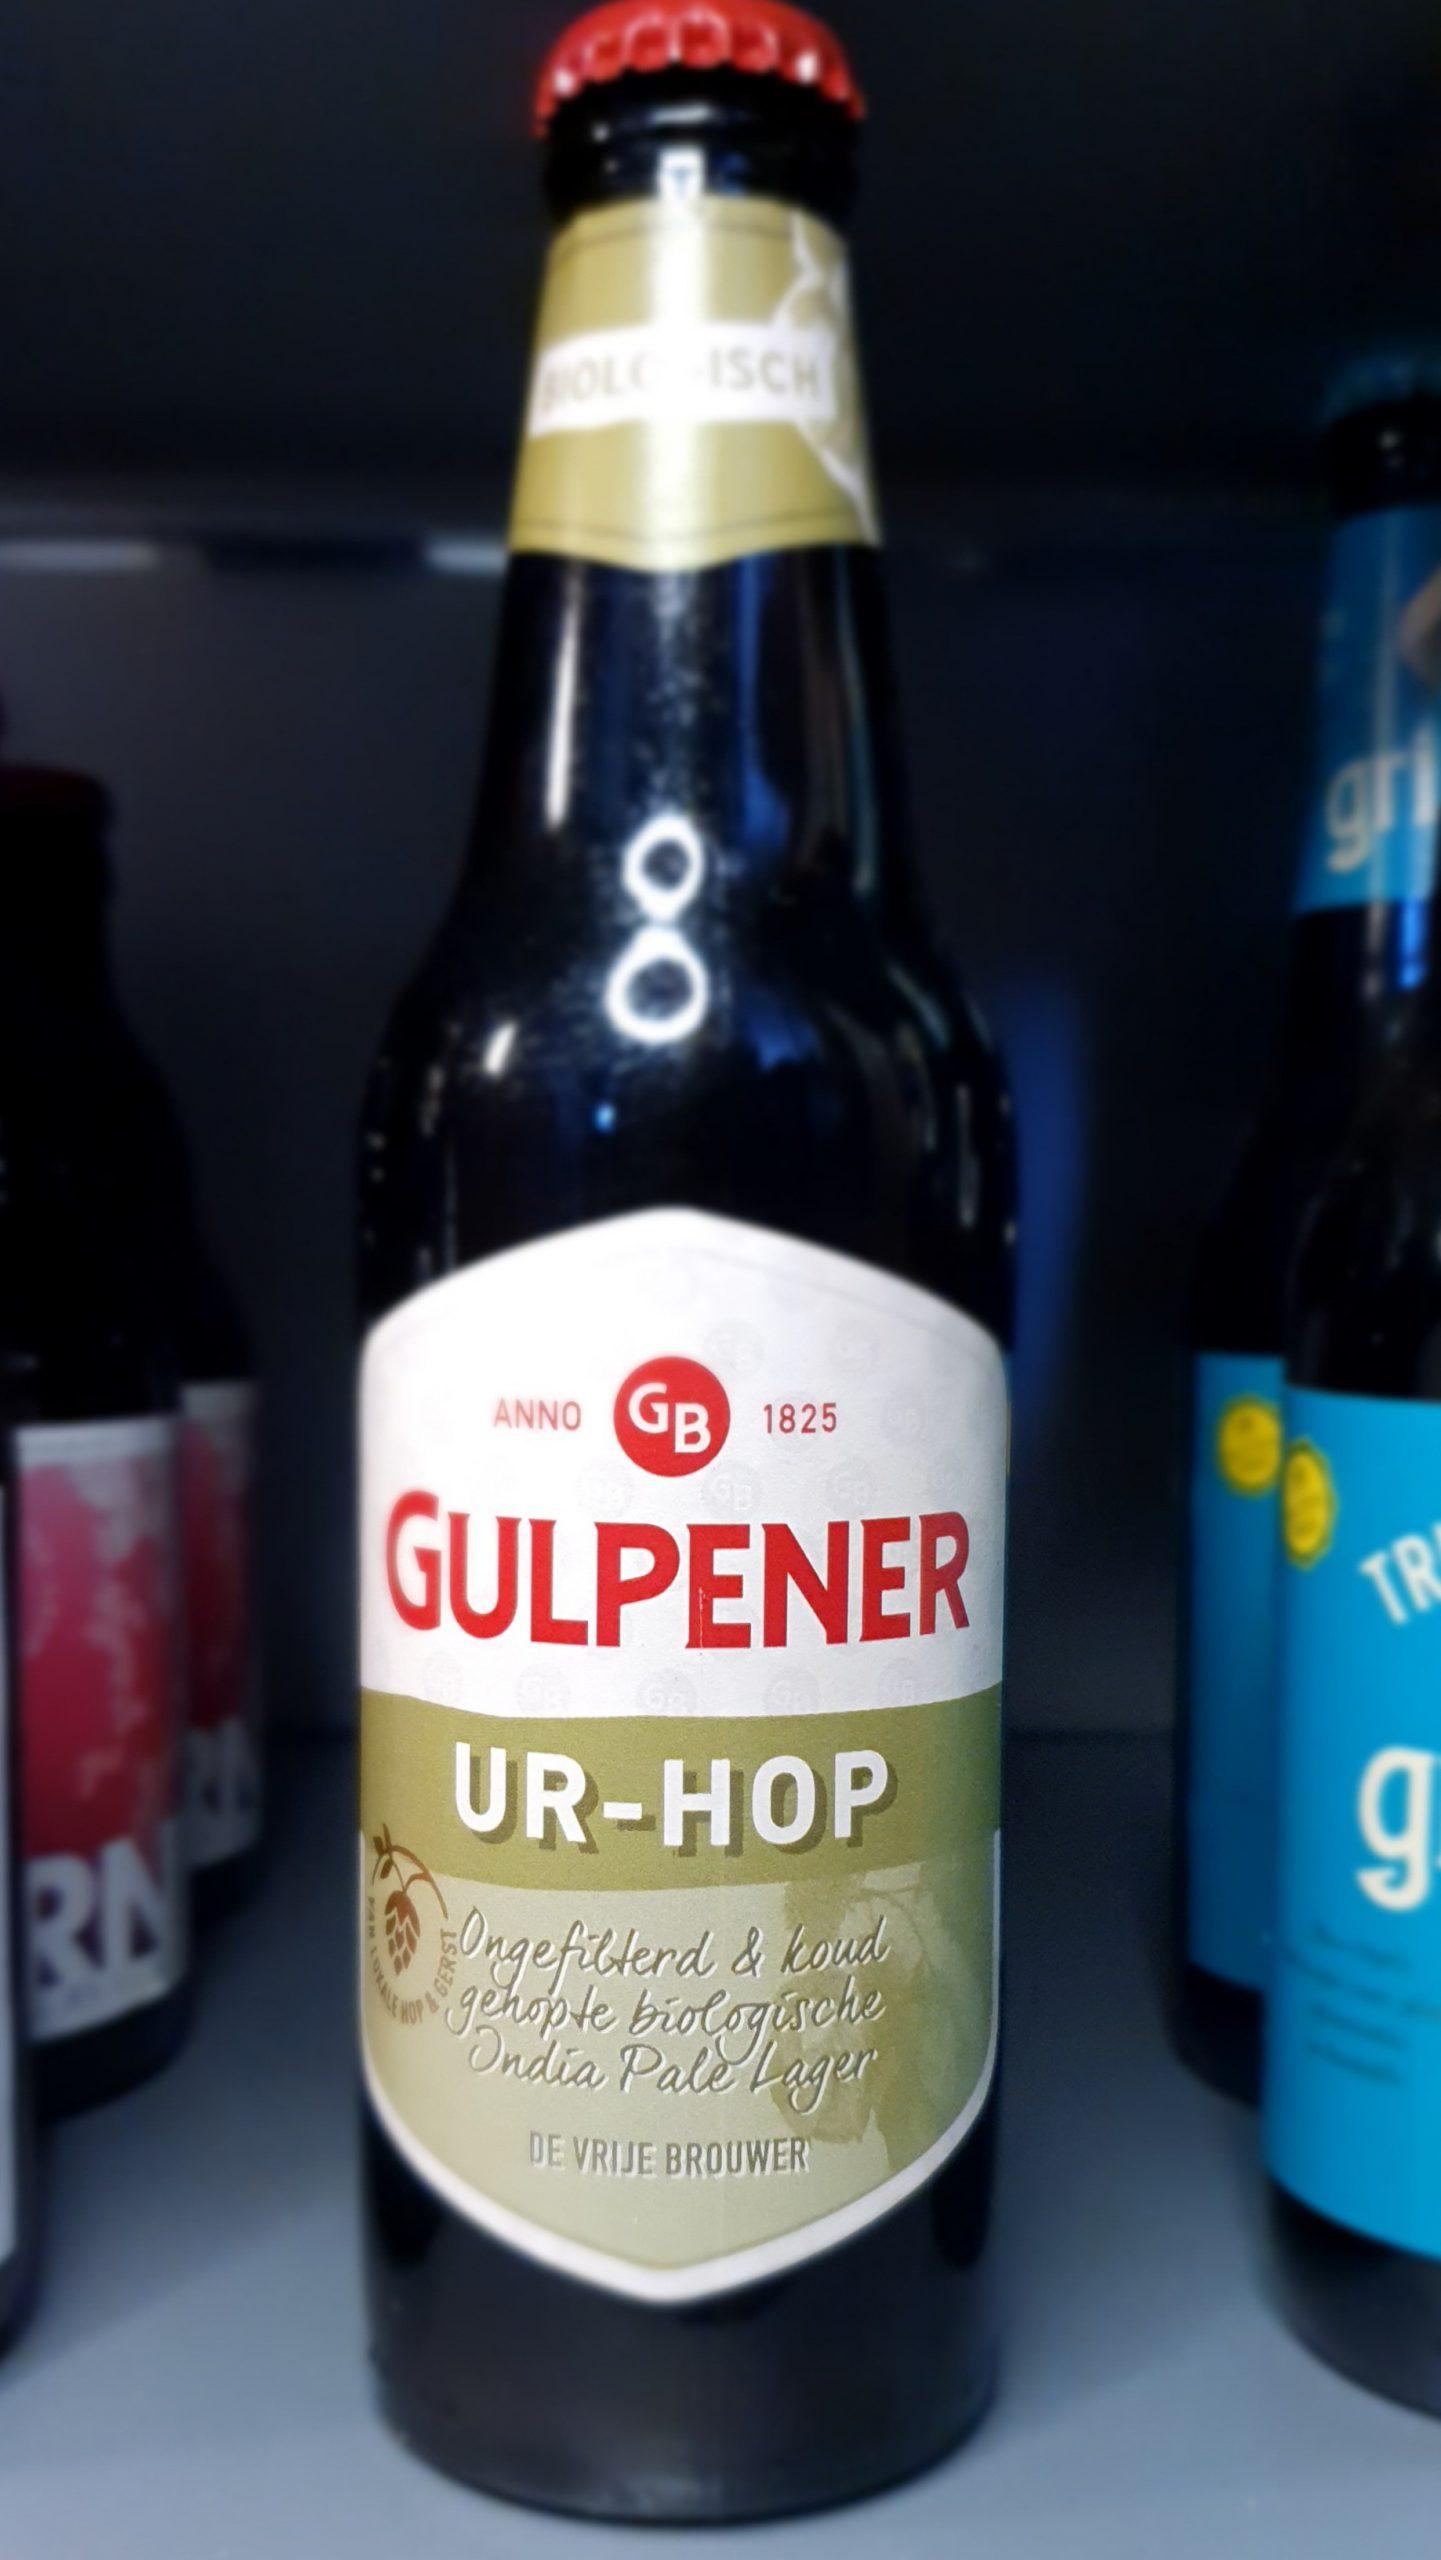 Gulpener Ur-Hop